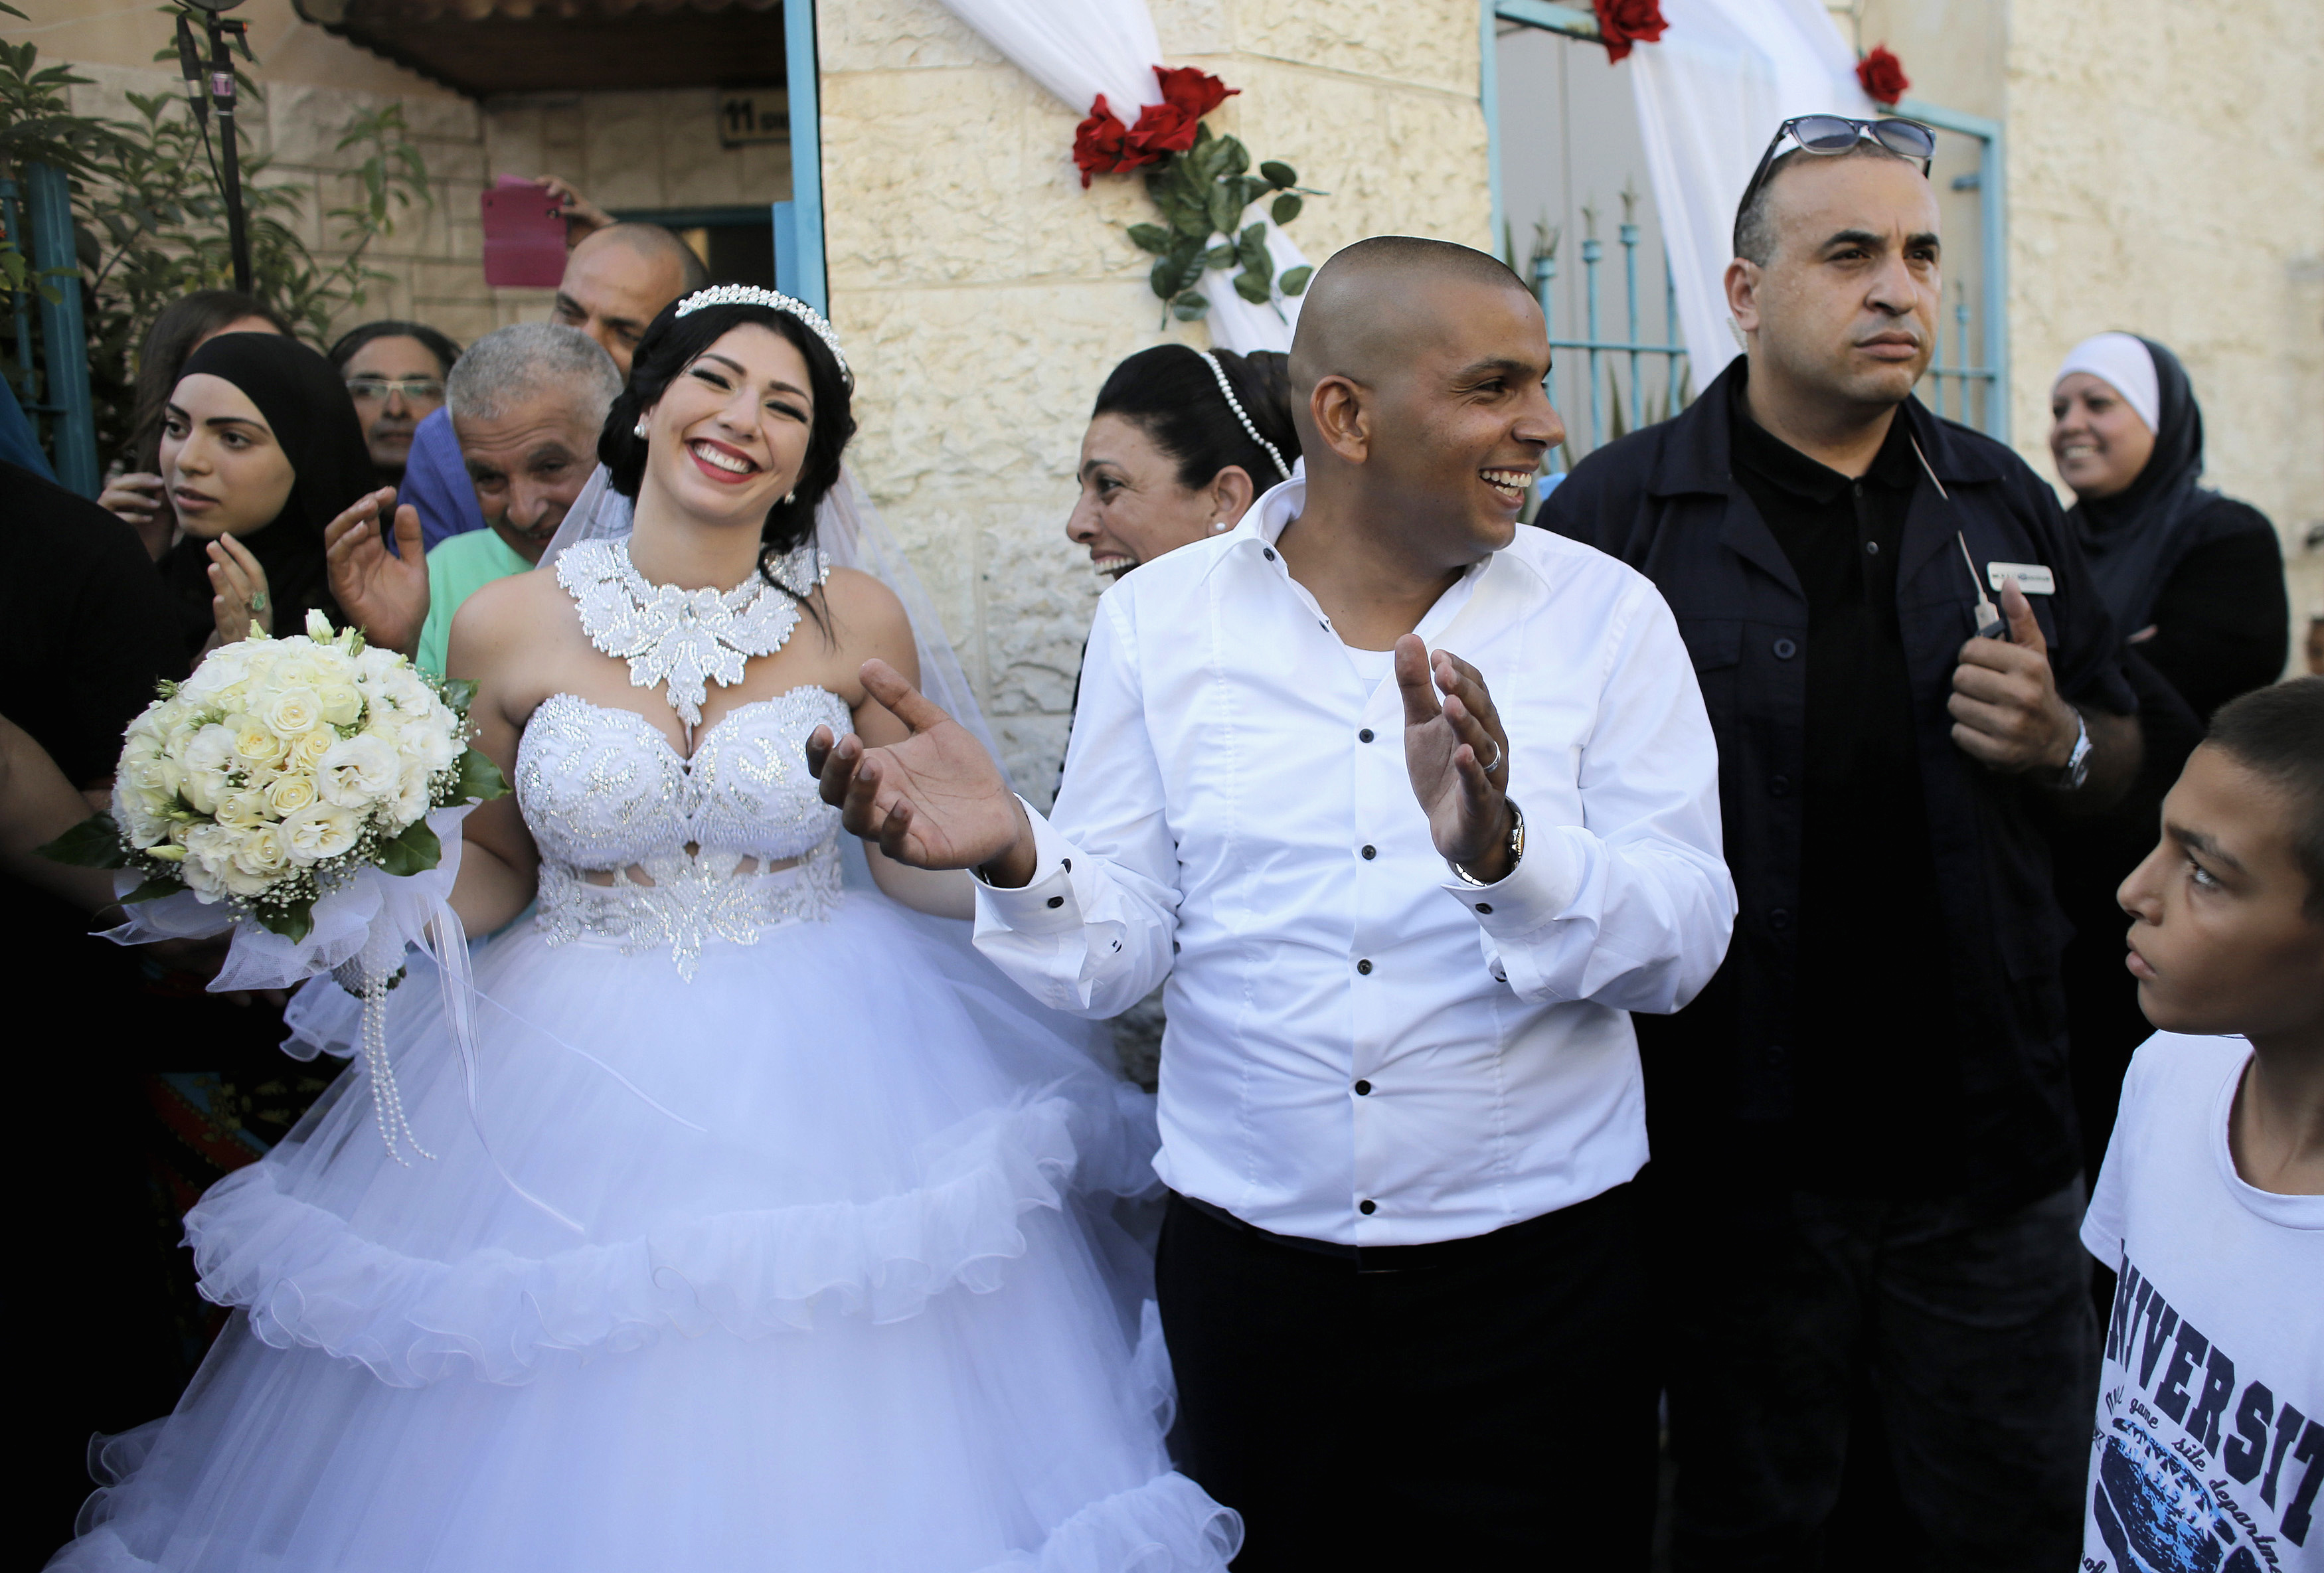 Israeli Palestinian Wedding Pictures Cbs News